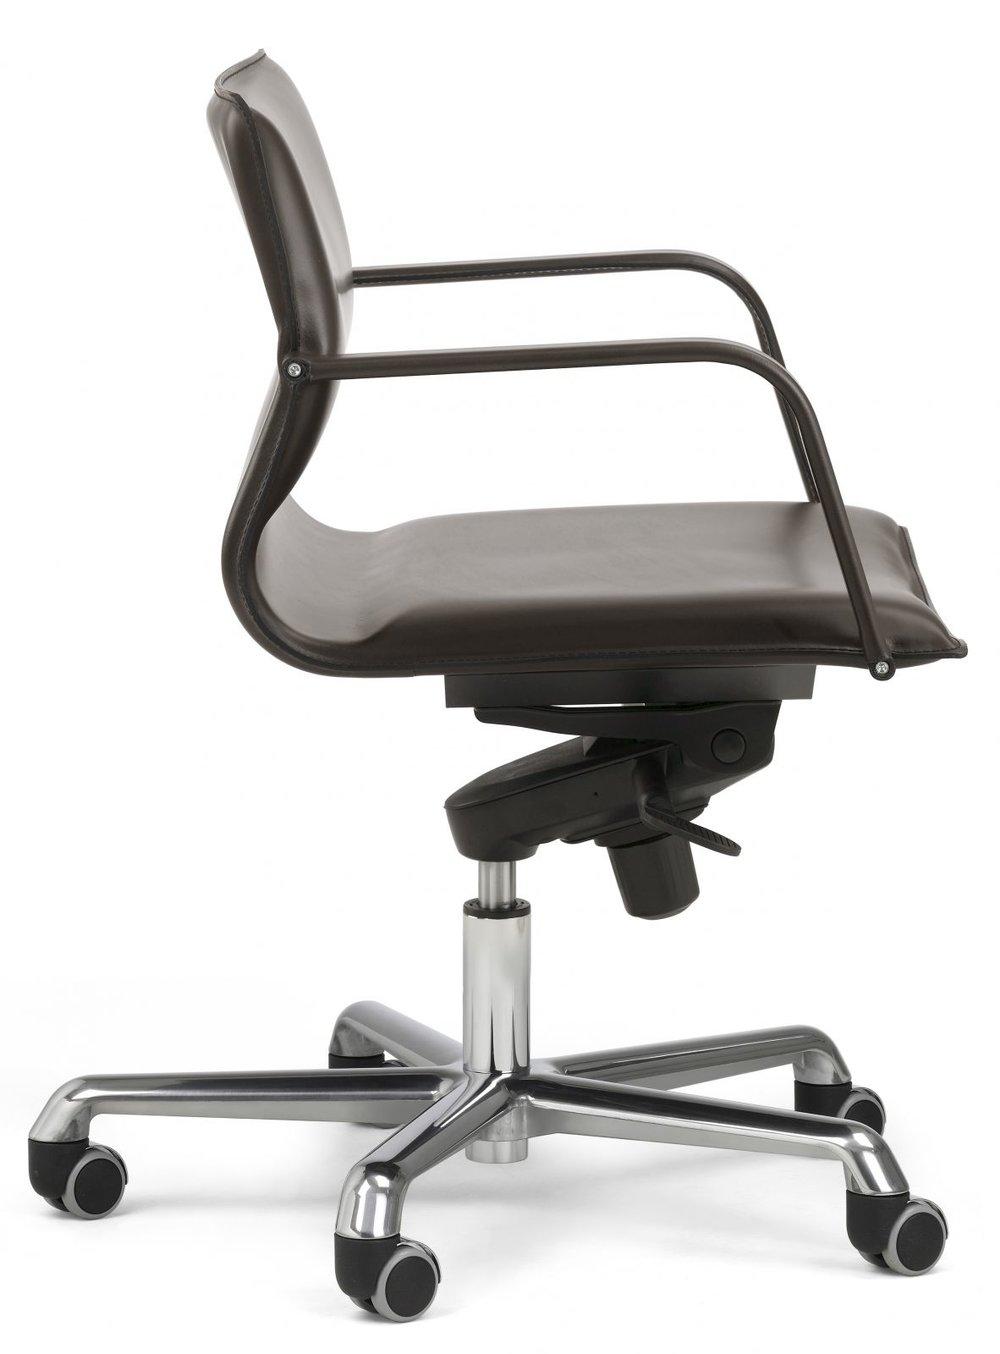 modern-office-chairs-Italian-furniture-designer-chairs (48).jpg